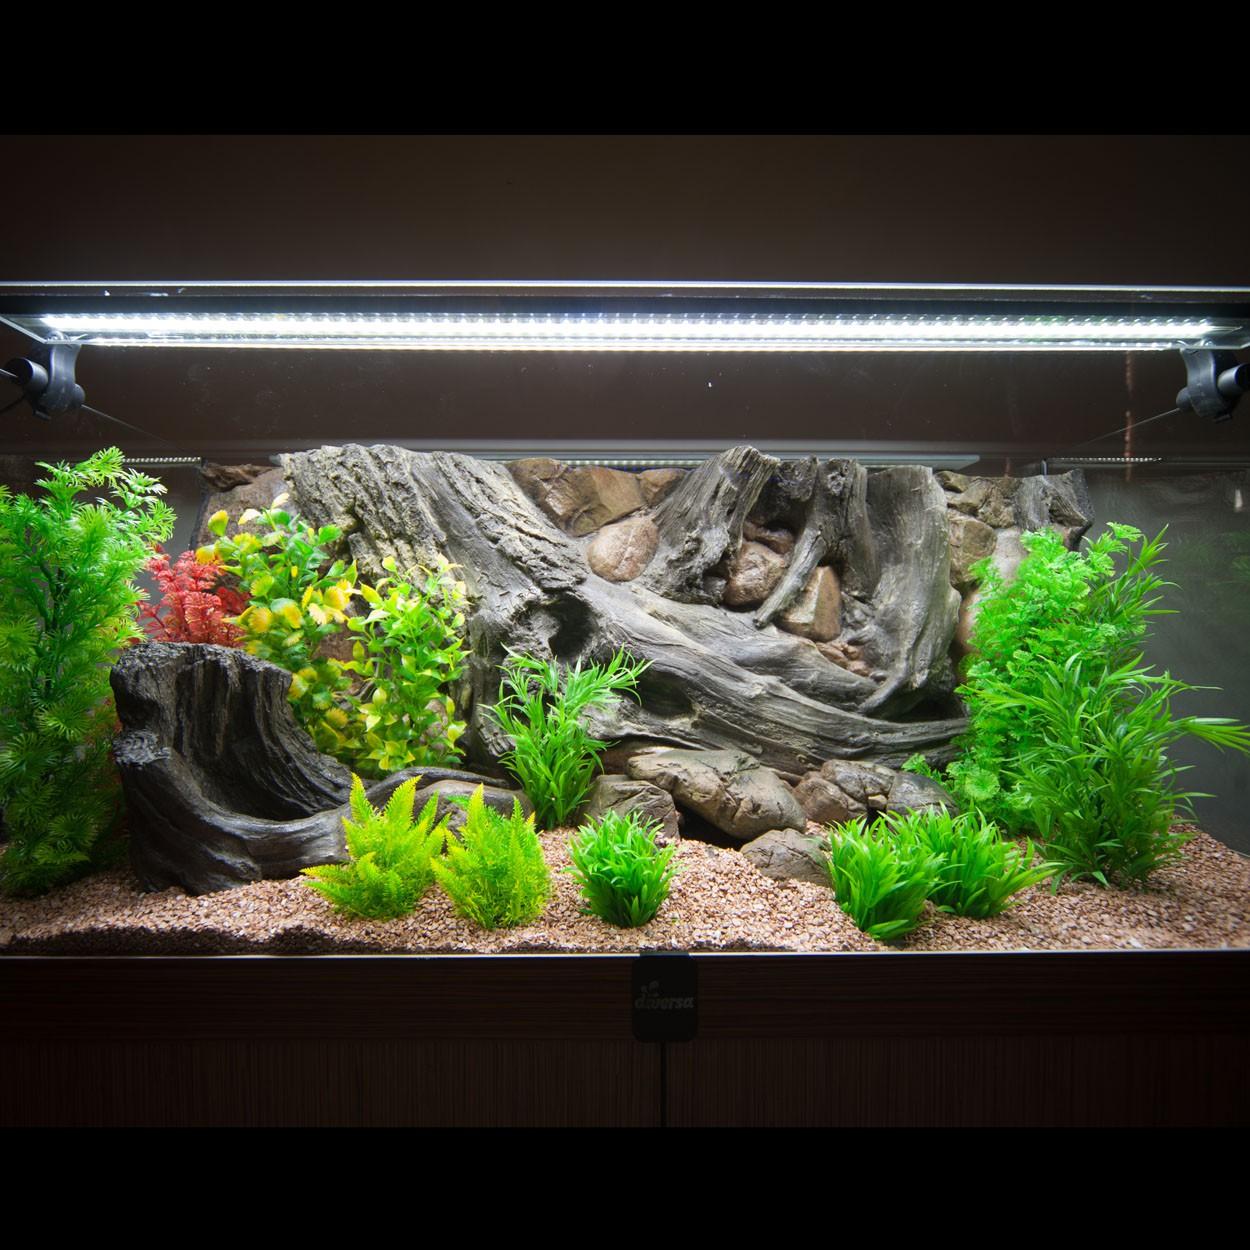 Bekannt 3d Aquarium Rückwand für Rio 240 Luxus-Line FIF Aquaristik Welt 3d HP98